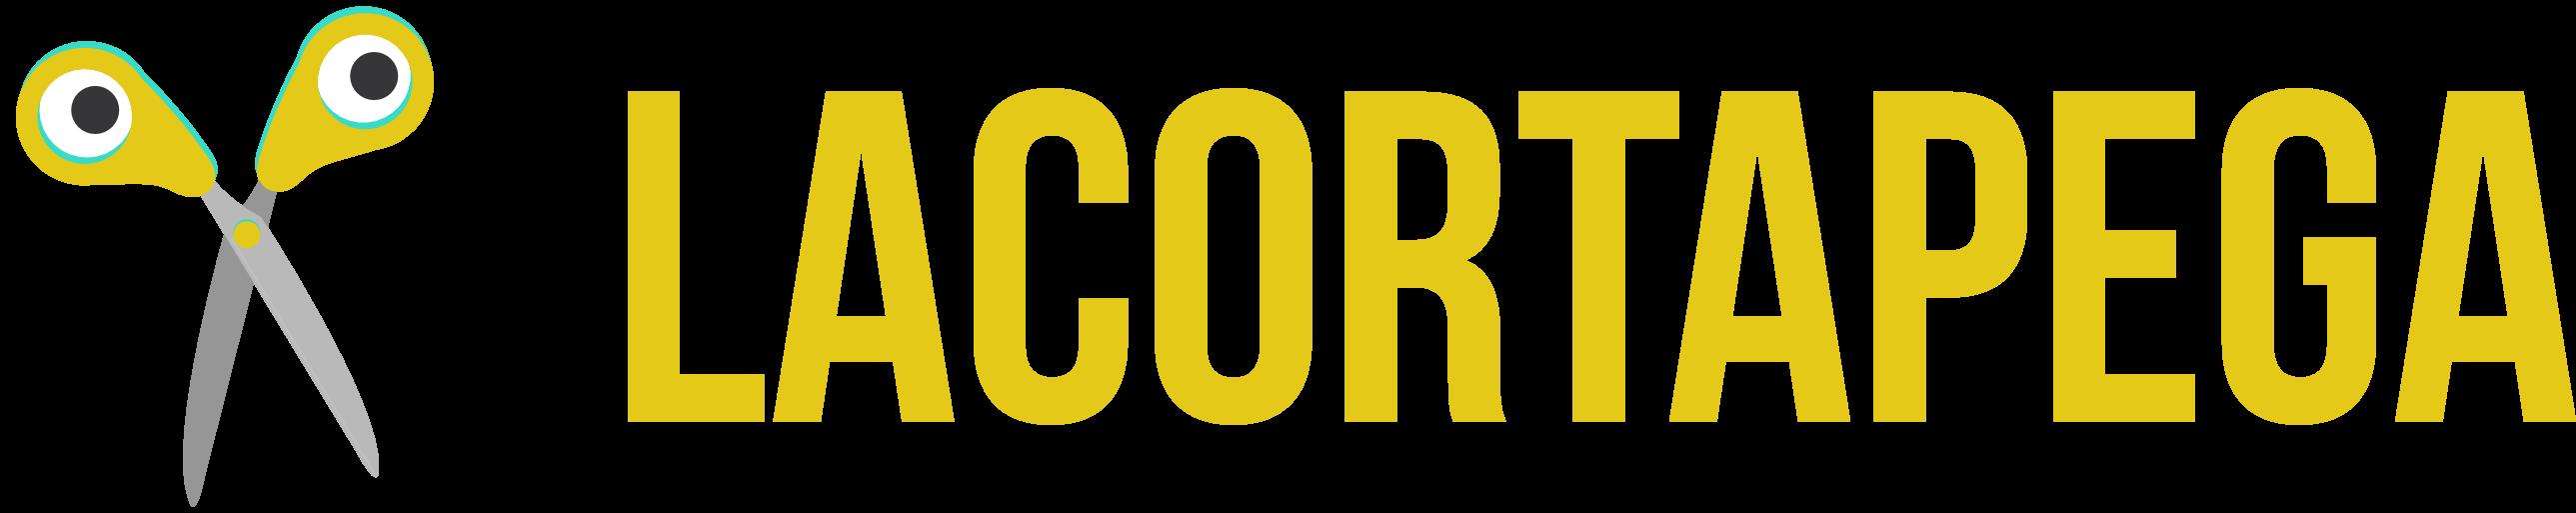 LaCortaPega